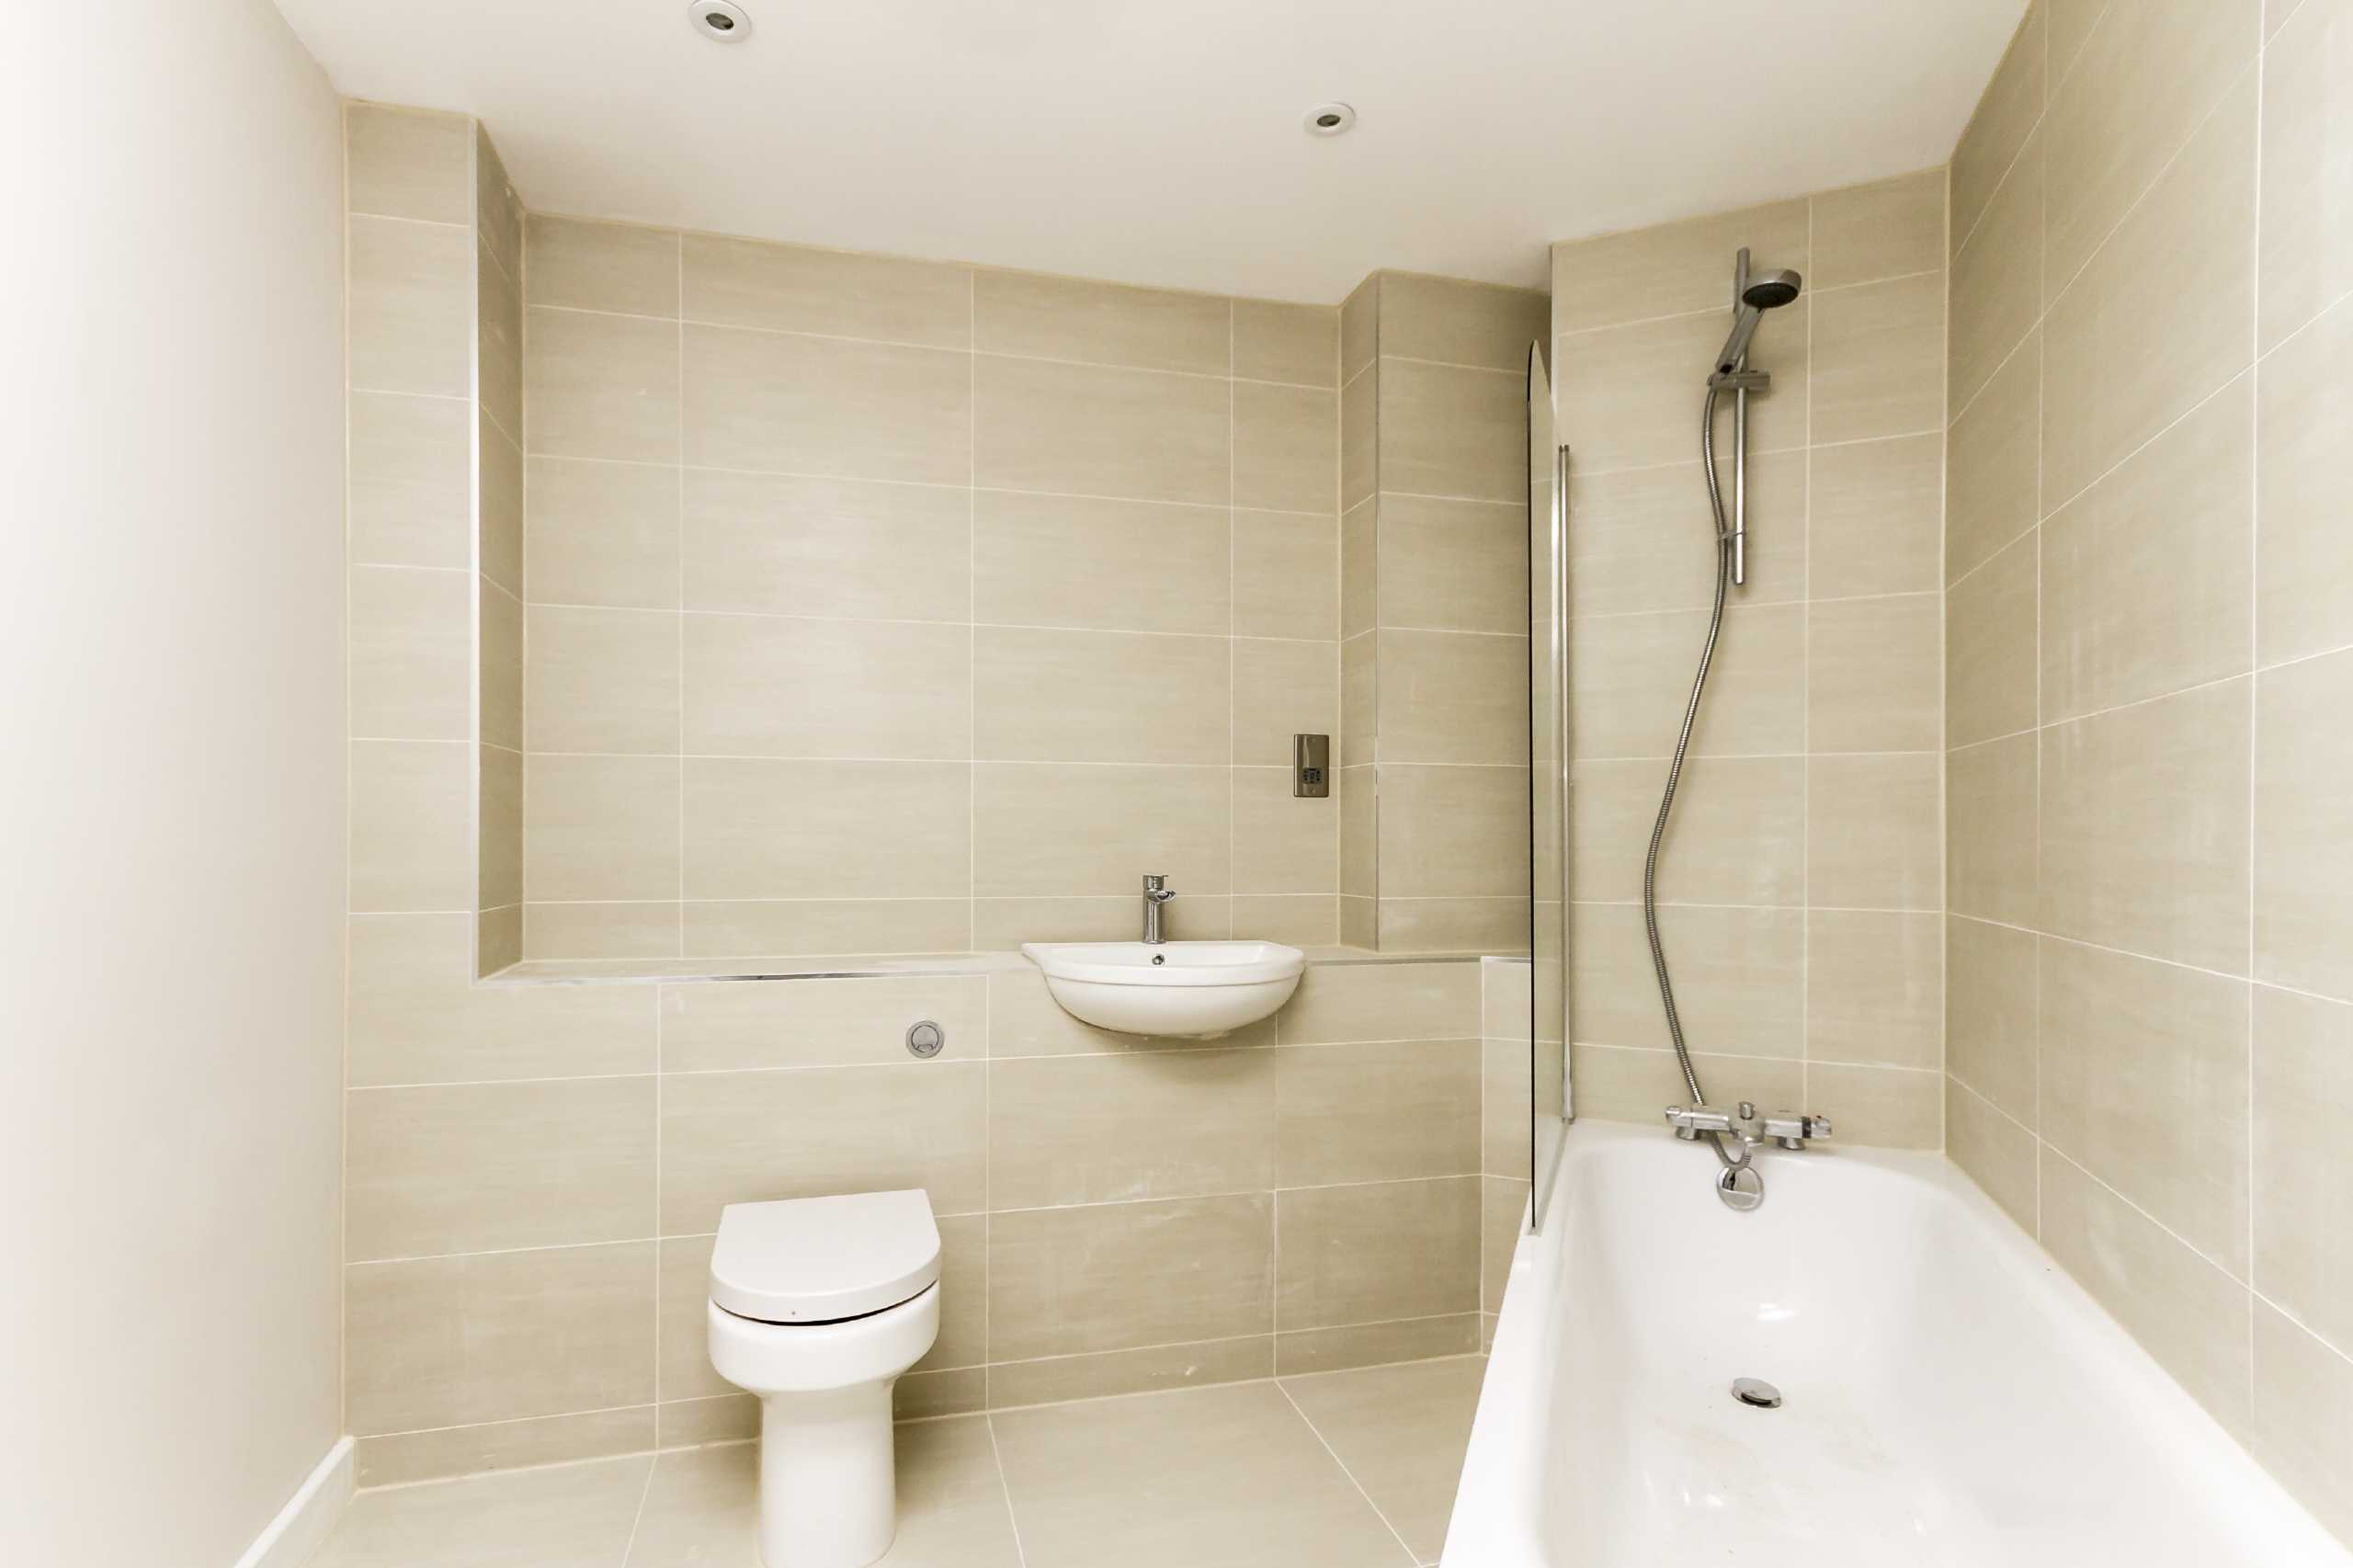 3 Bedroom Flat For Sale Cleaves Almshouses Old London Road Kingston Upon Thames Kt Kingston